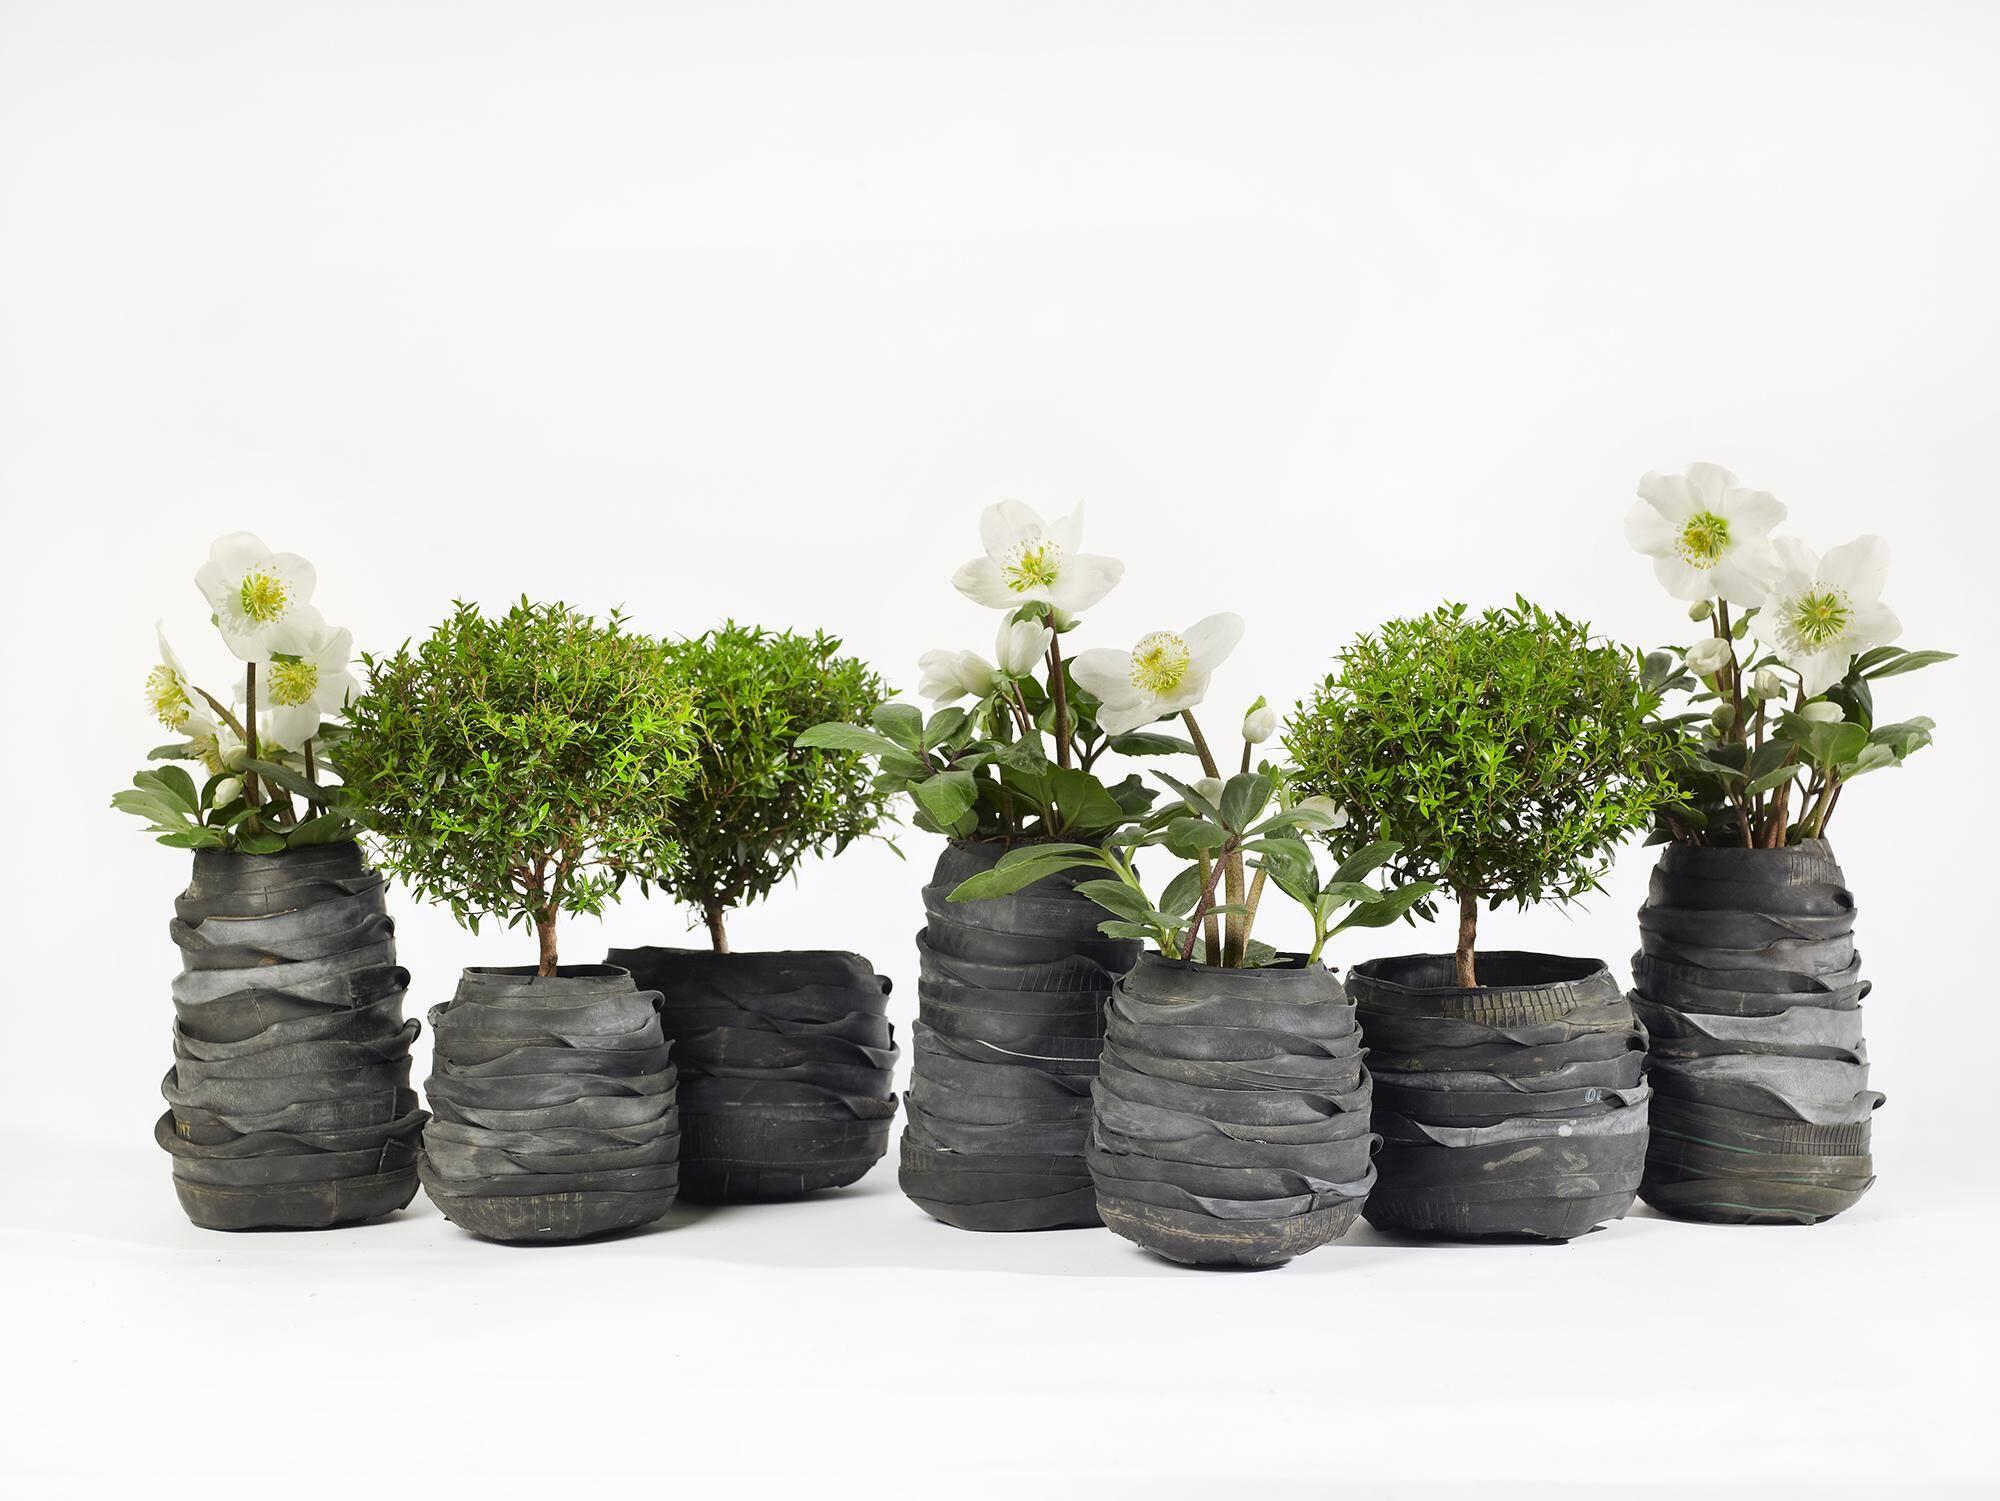 Flower Pots Can Transform Any Garden Or Interior